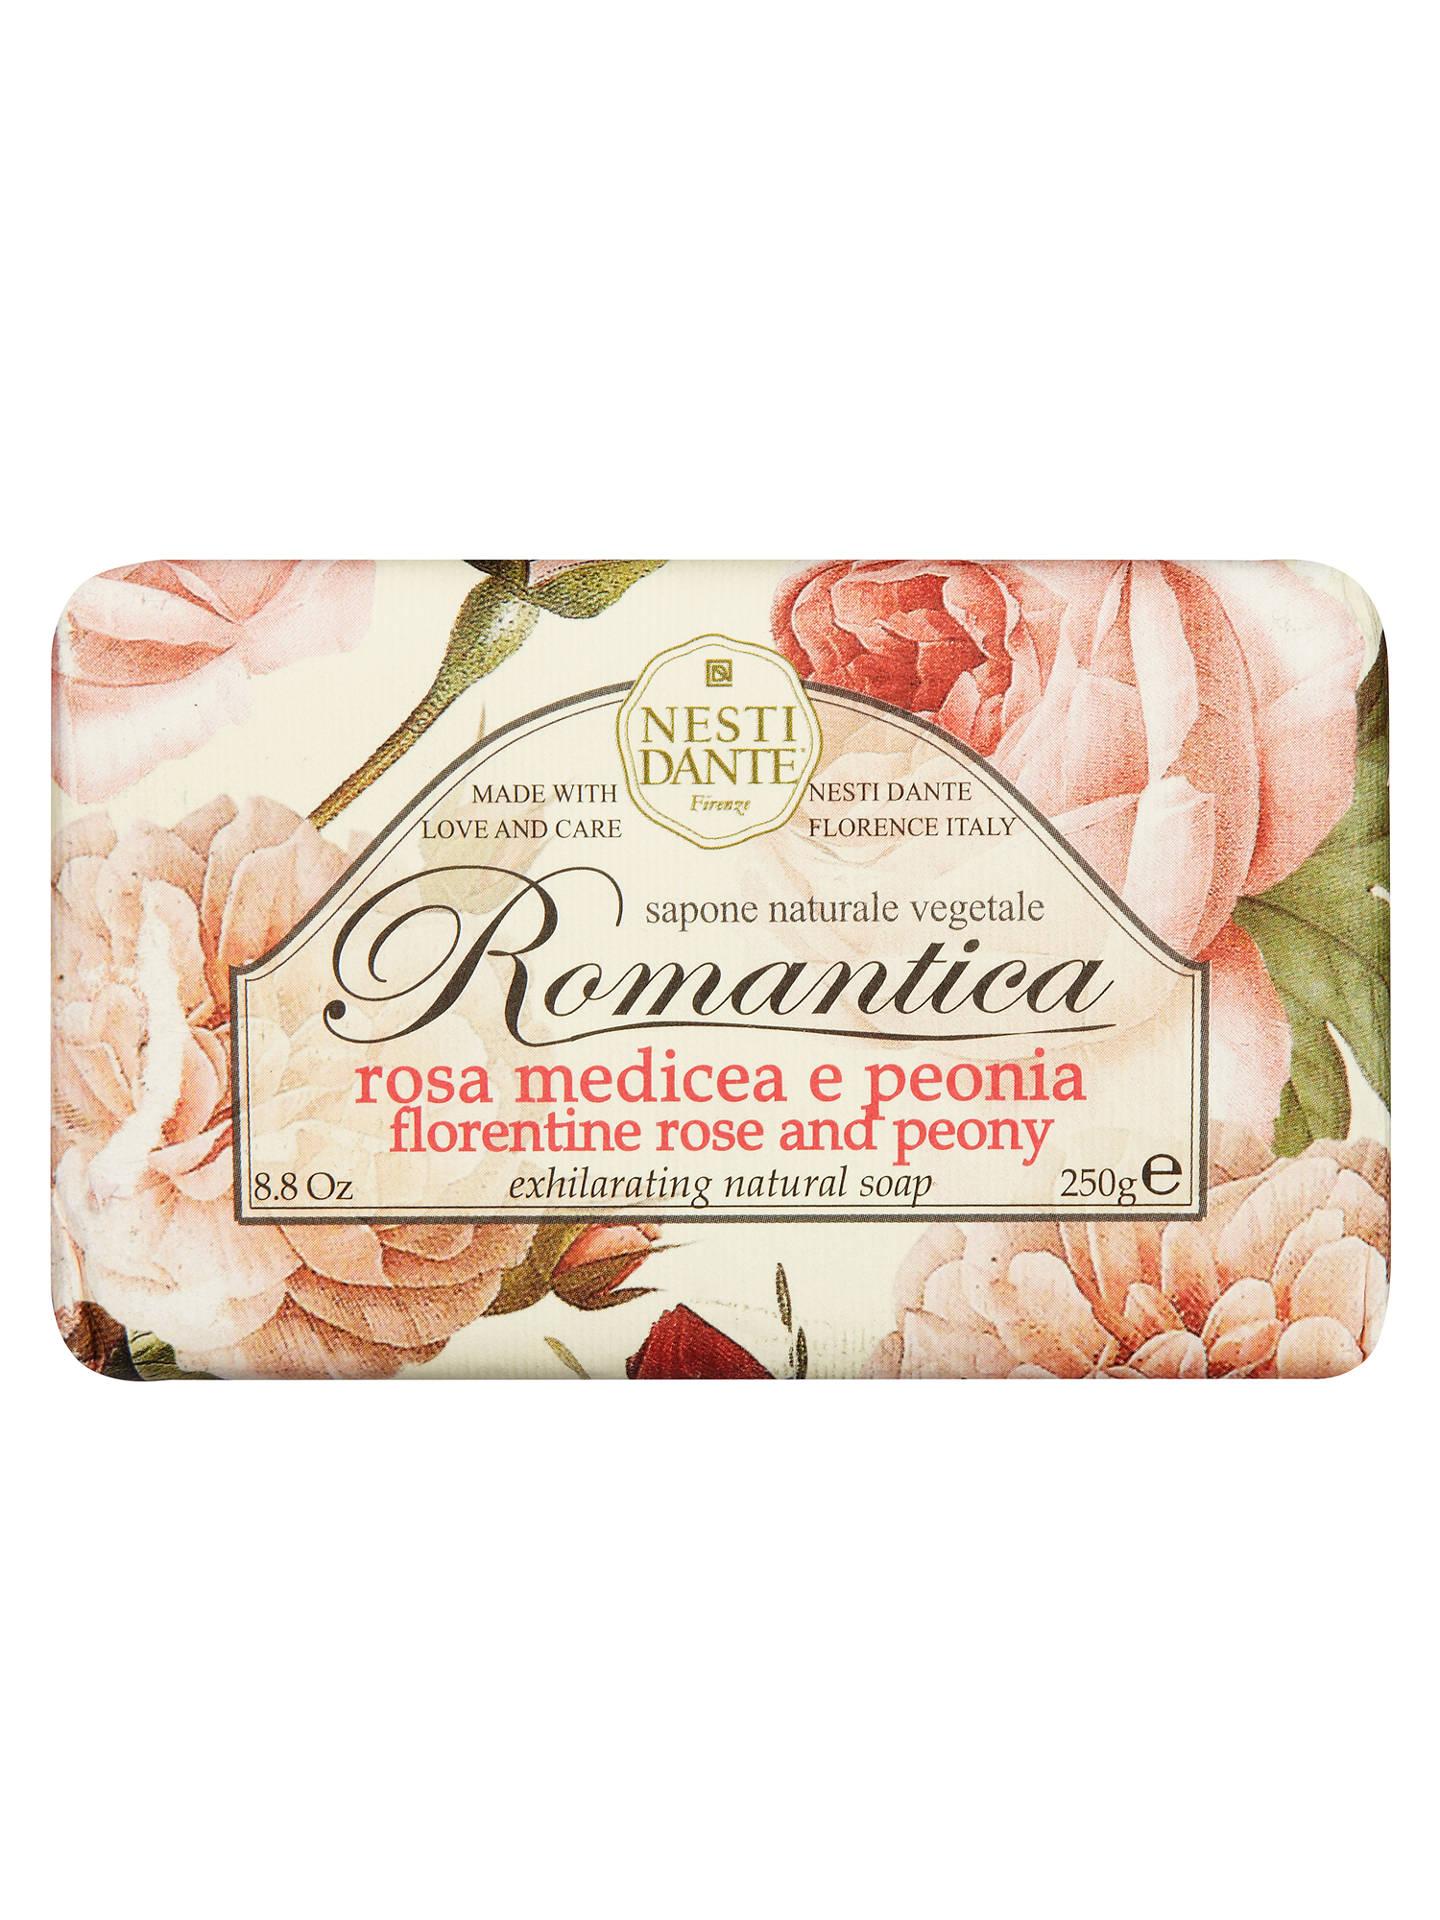 Health & Beauty Collection Here Nesti Dante Romantica Florentine Rose Peony 250g